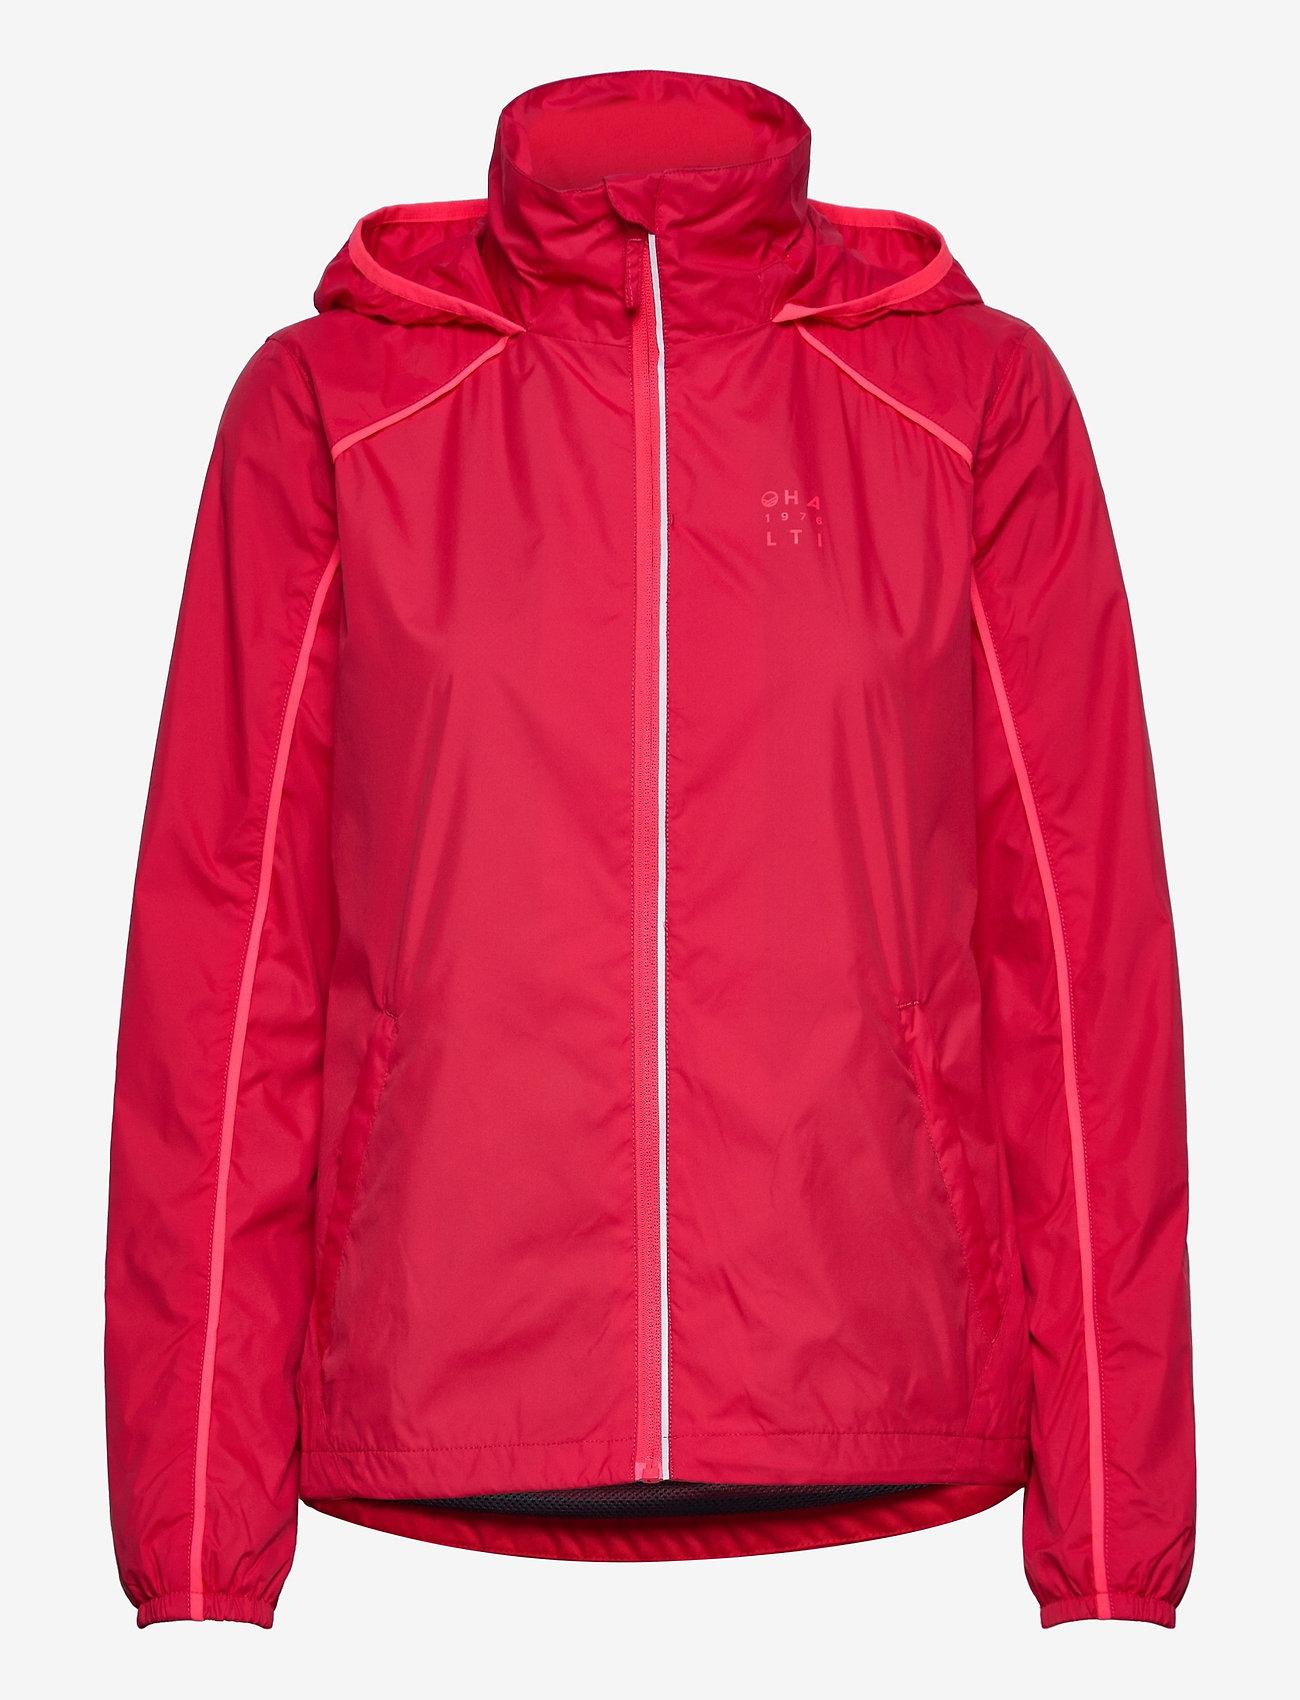 Halti - Reitti W windbraker jacket - koulutustakit - ski patrol red - 0